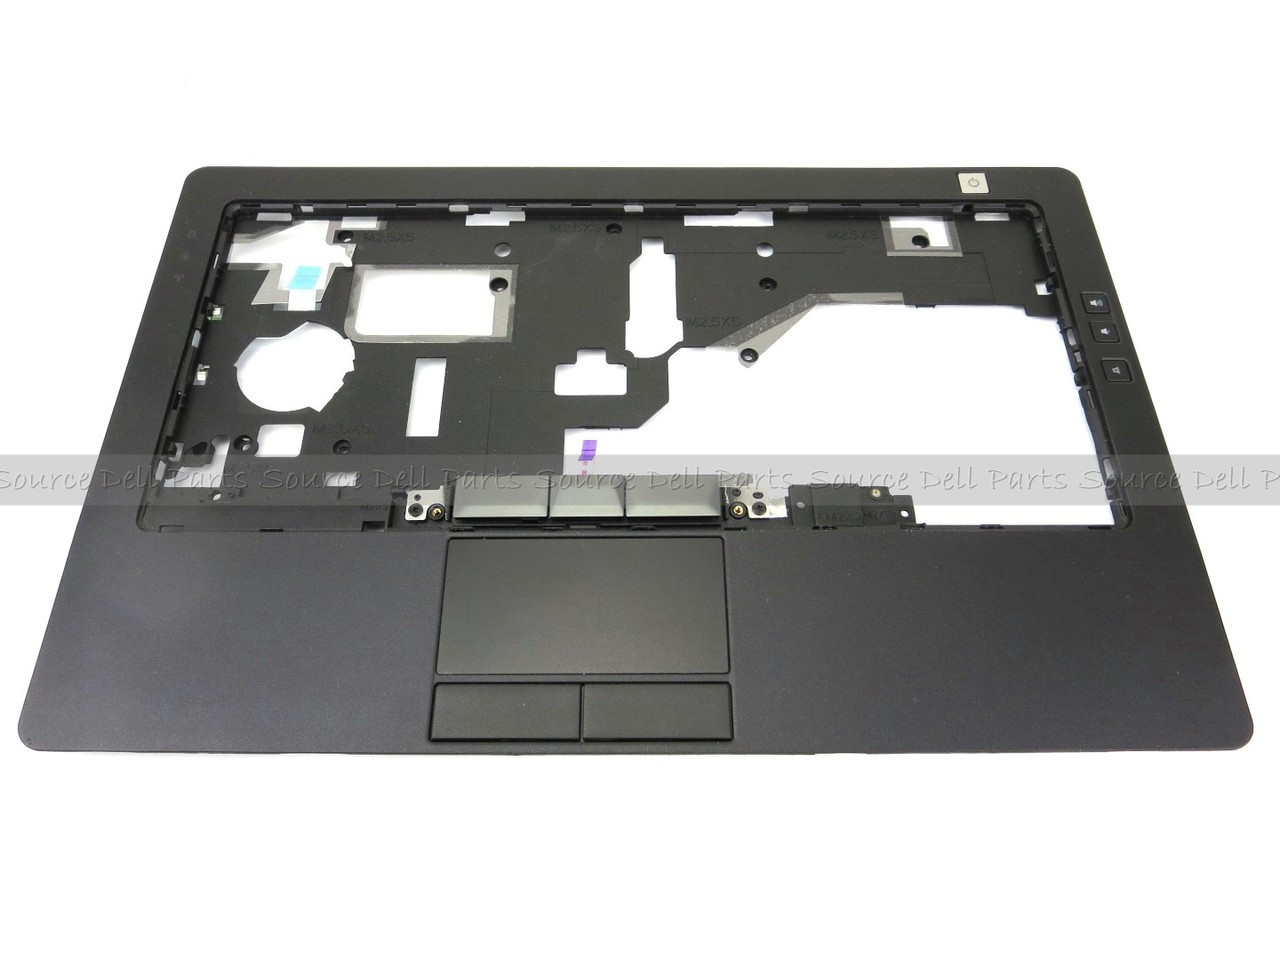 Dell Latitude E6330 Palmrest Touchpad Assembly - M1WJD